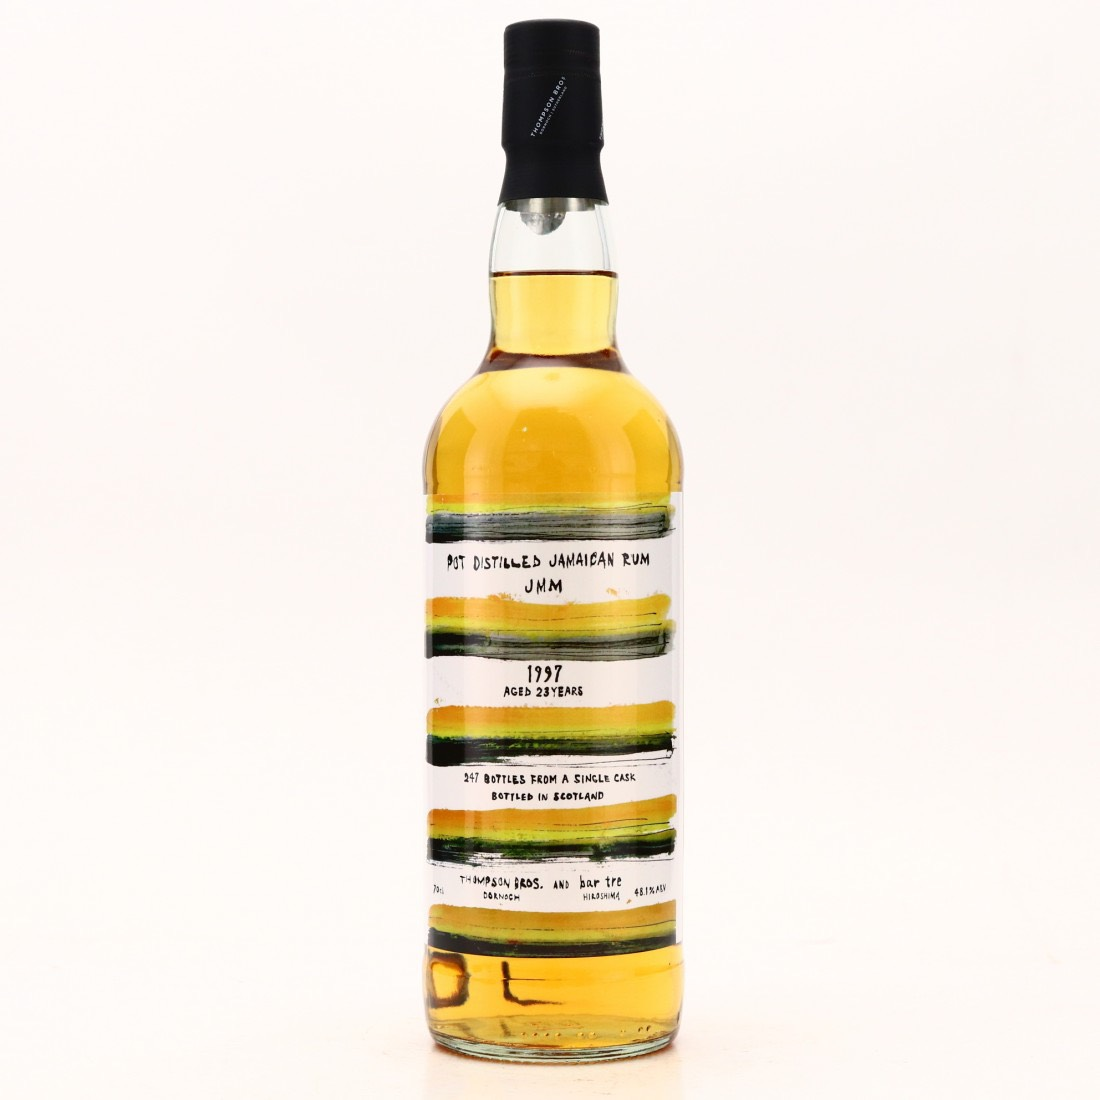 Bottle image of Pot Distilled Jamaican Rum (Bar Tre) JMM